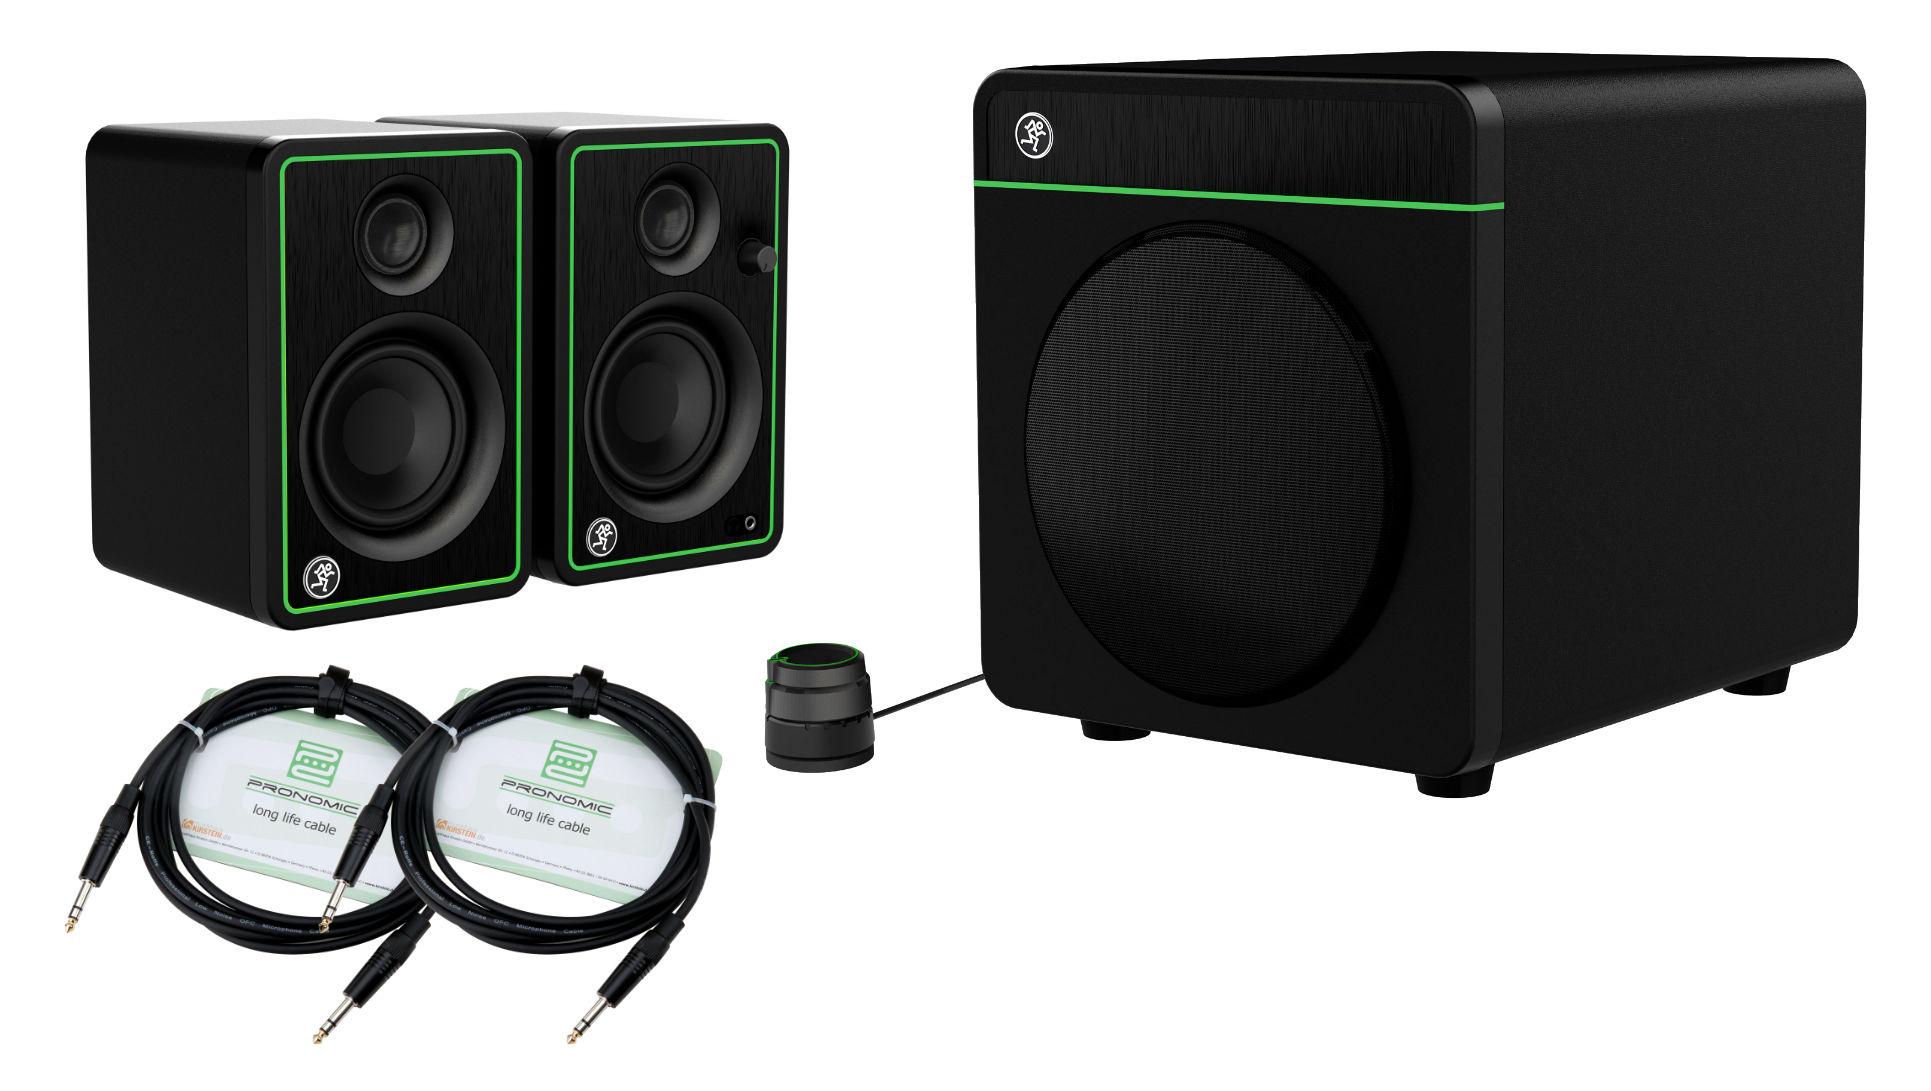 Studiomonitore - Mackie CR3 X Multimedia Bluetooth 2.1 Soundsystem - Onlineshop Musikhaus Kirstein